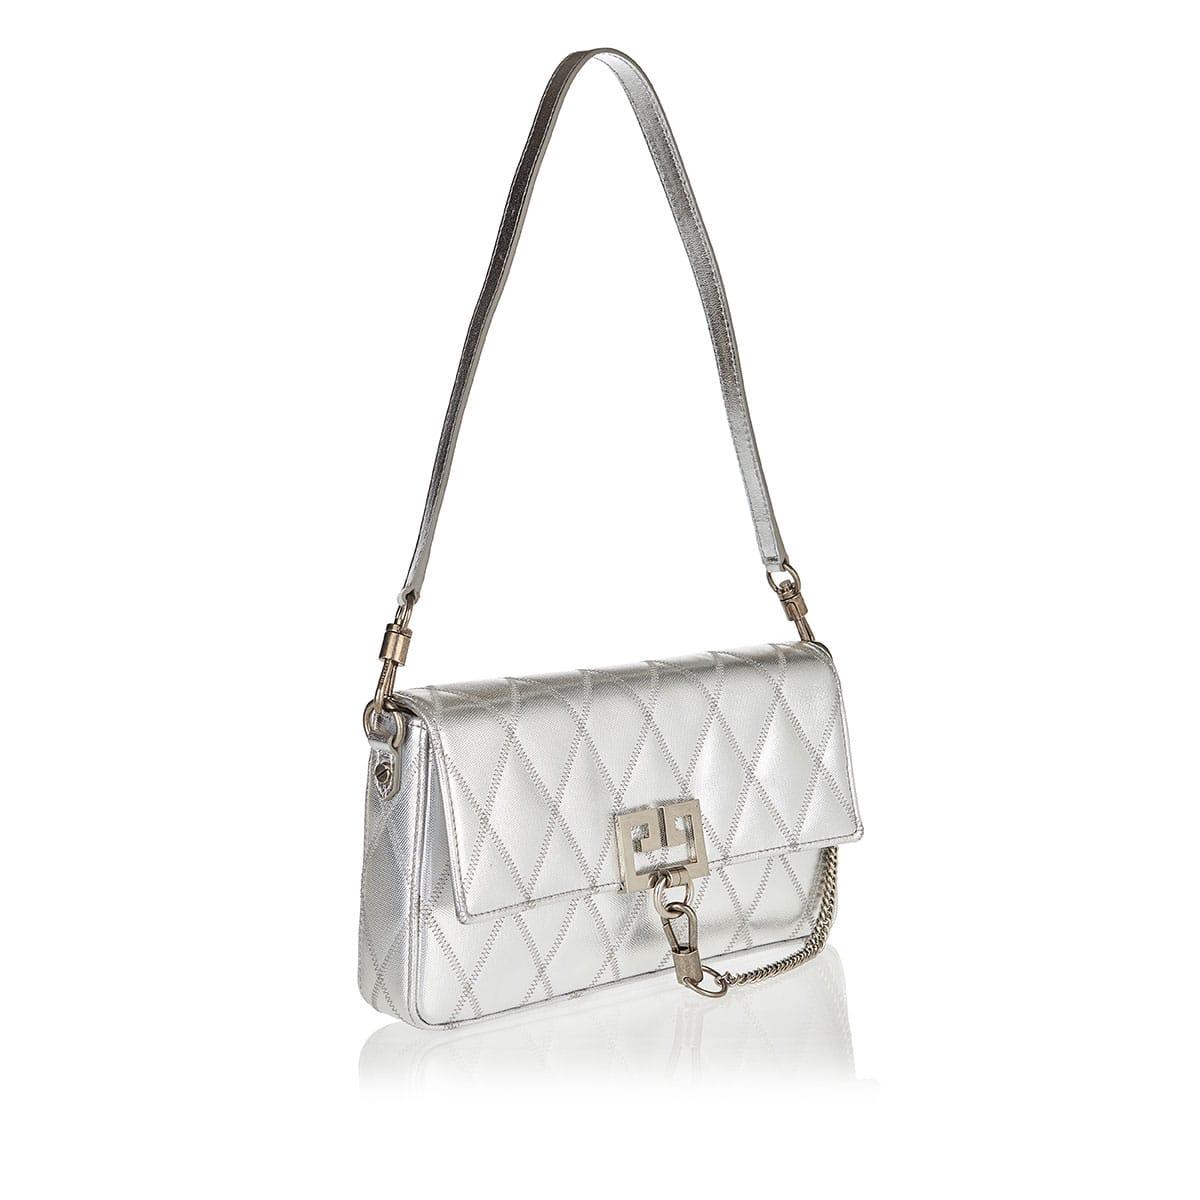 GV Charm metallic quilted shoulder bag